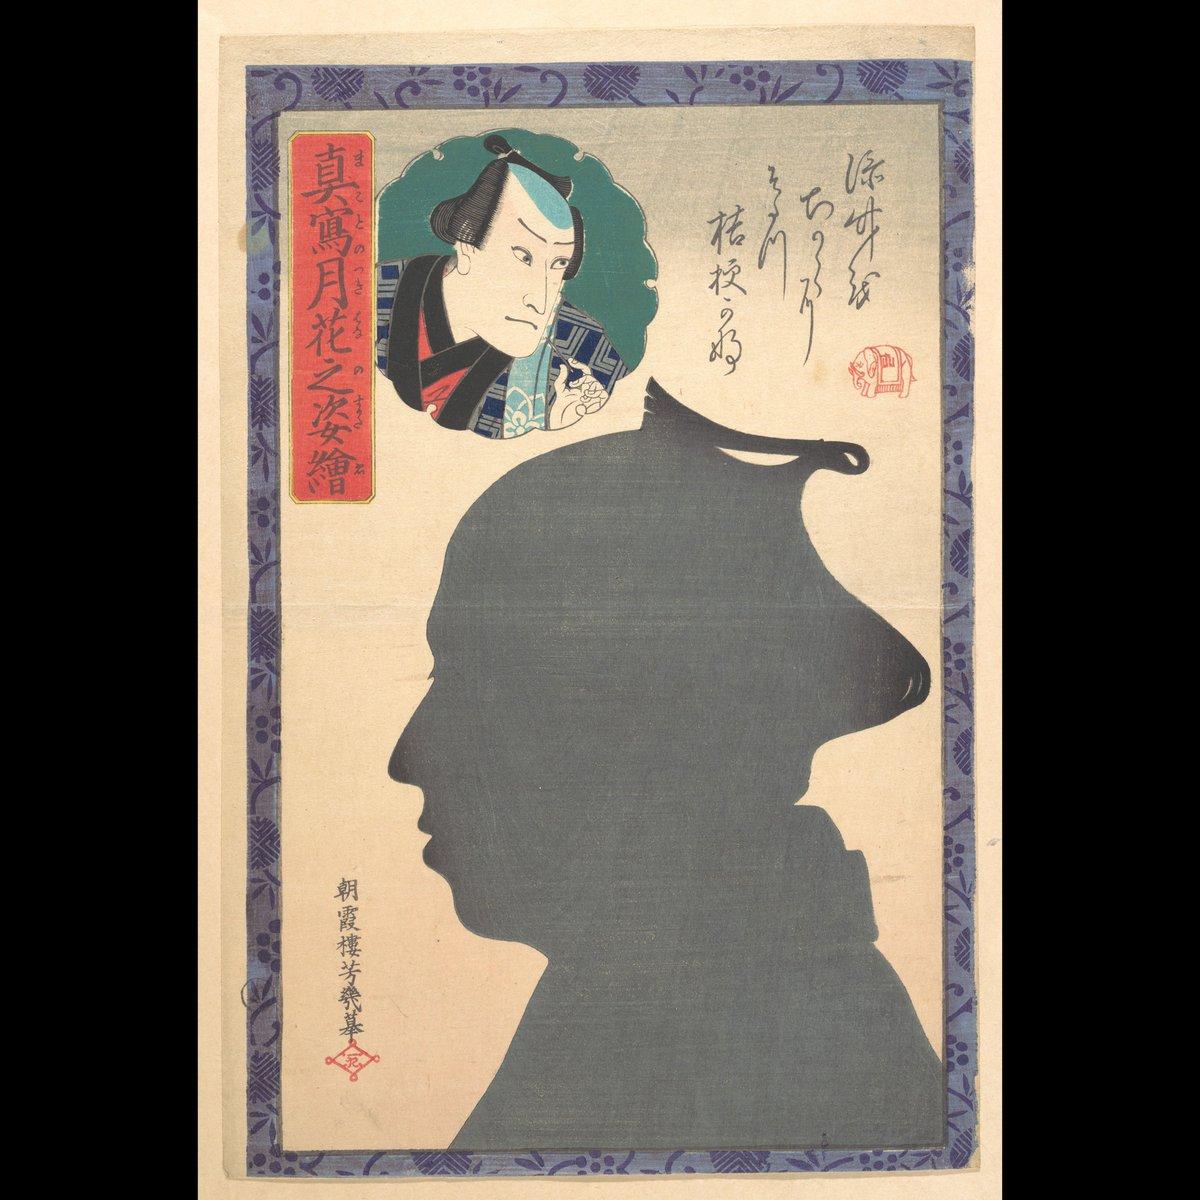 Silhouette Image of Kabuki Actor Print period: Meiji period (1868–1912) created by: Utagawa Yoshiiku  #art #artwork #artlover #artaccount #arte #アート #艺术 #UtagawaYoshiiku https://t.co/6fdrZSgbkO